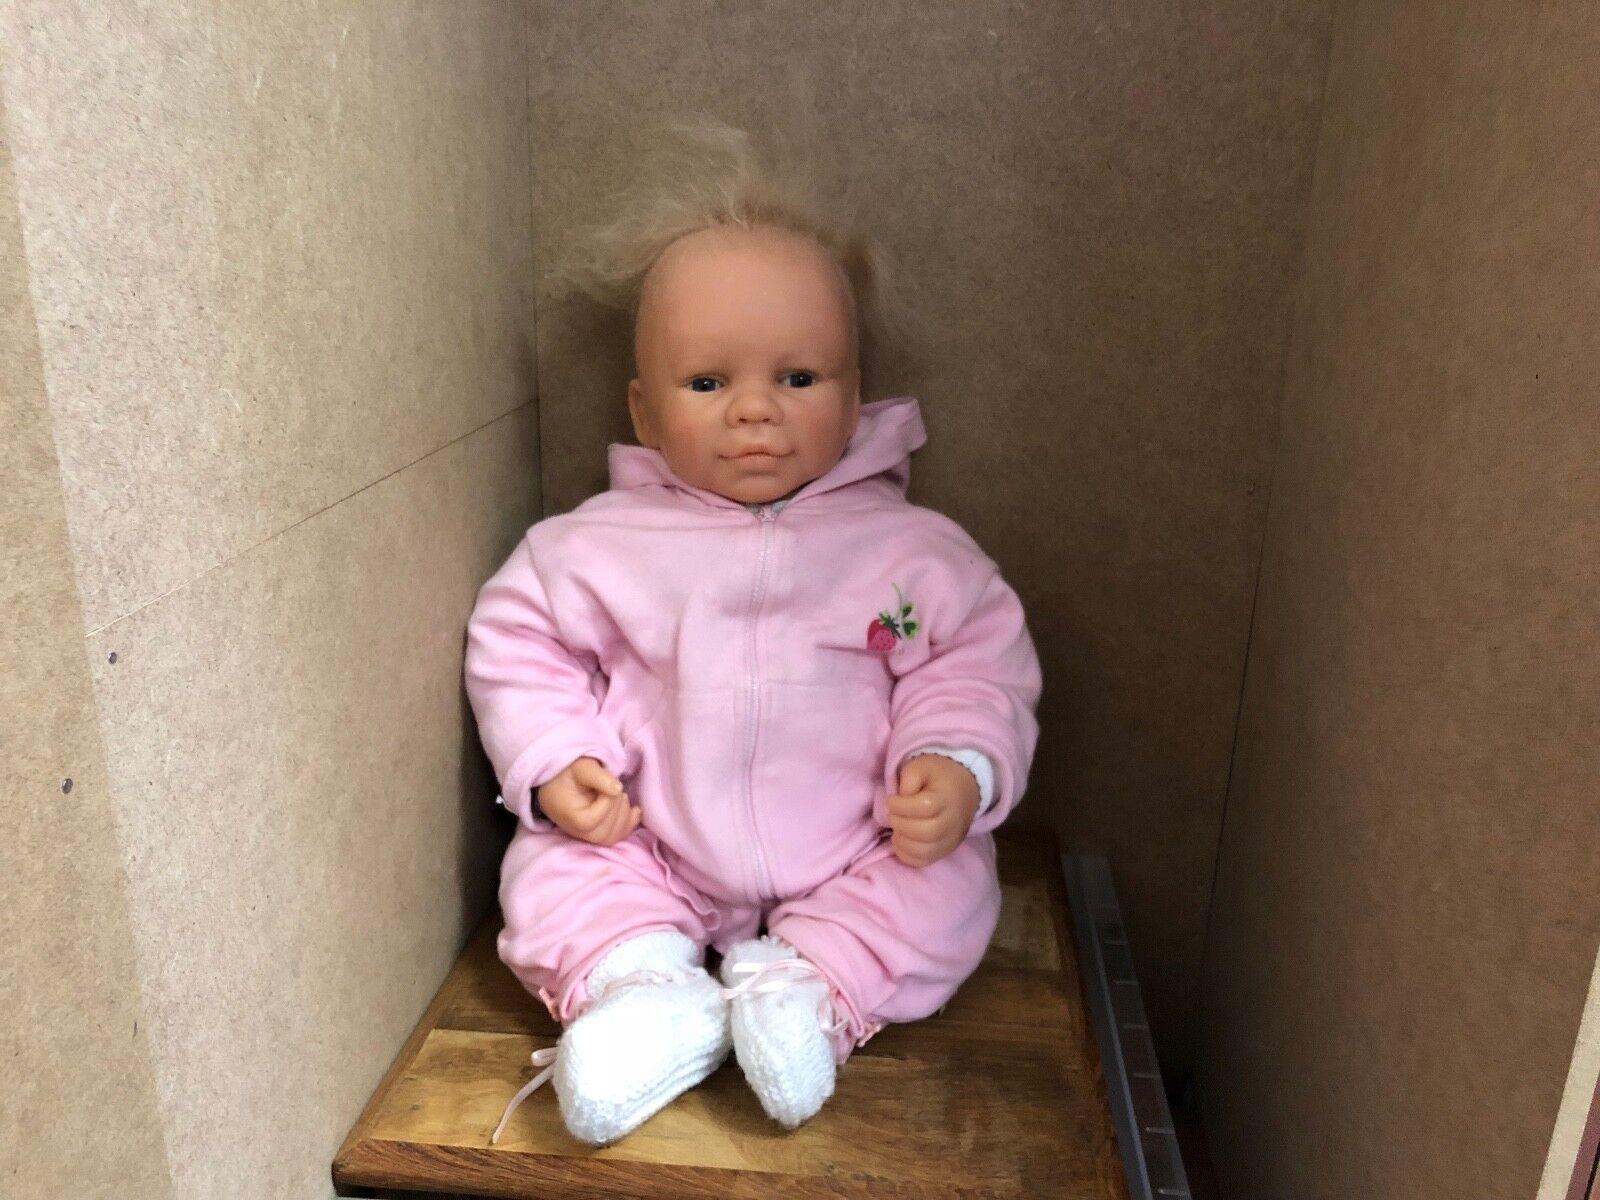 Artistas muñeca resin muñeca 51 cm. top estado